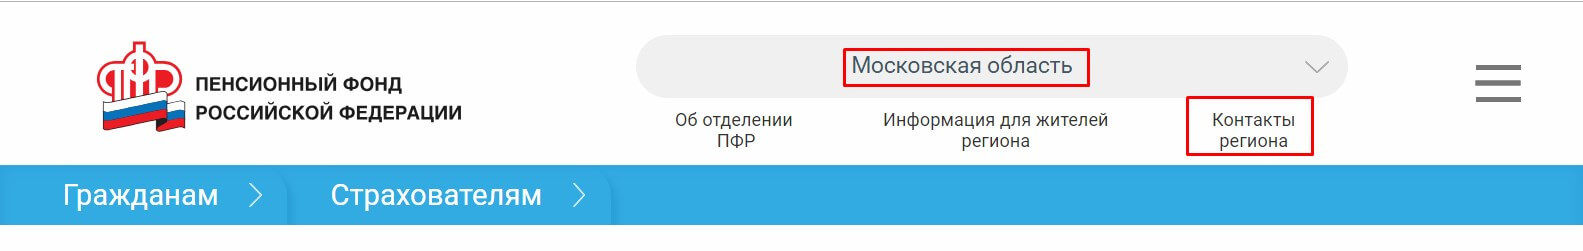 Пенсионный фонд г. Клин и Клинский район